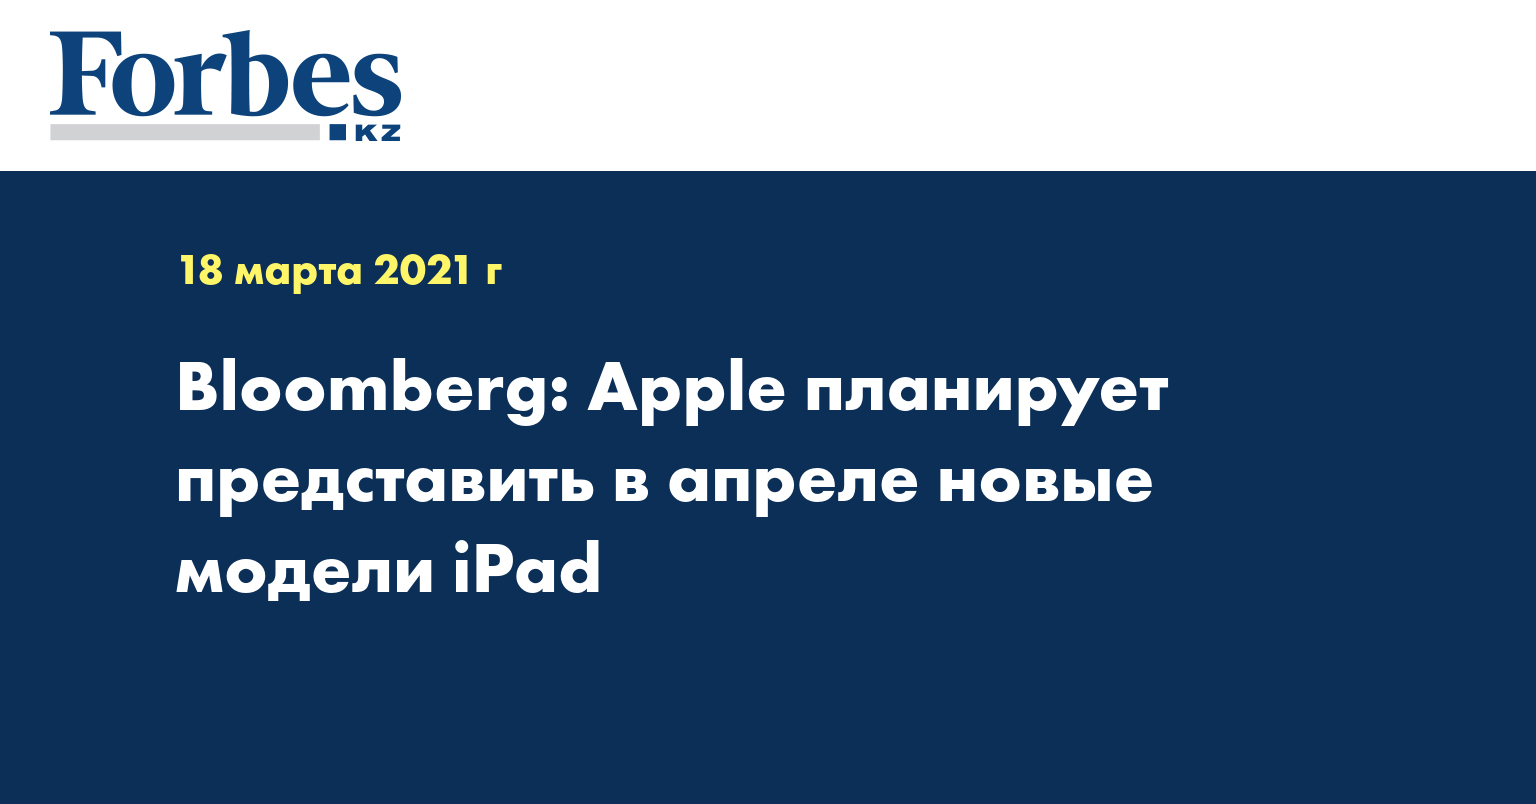 Bloomberg: Apple планирует представить в апреле новые модели iPad